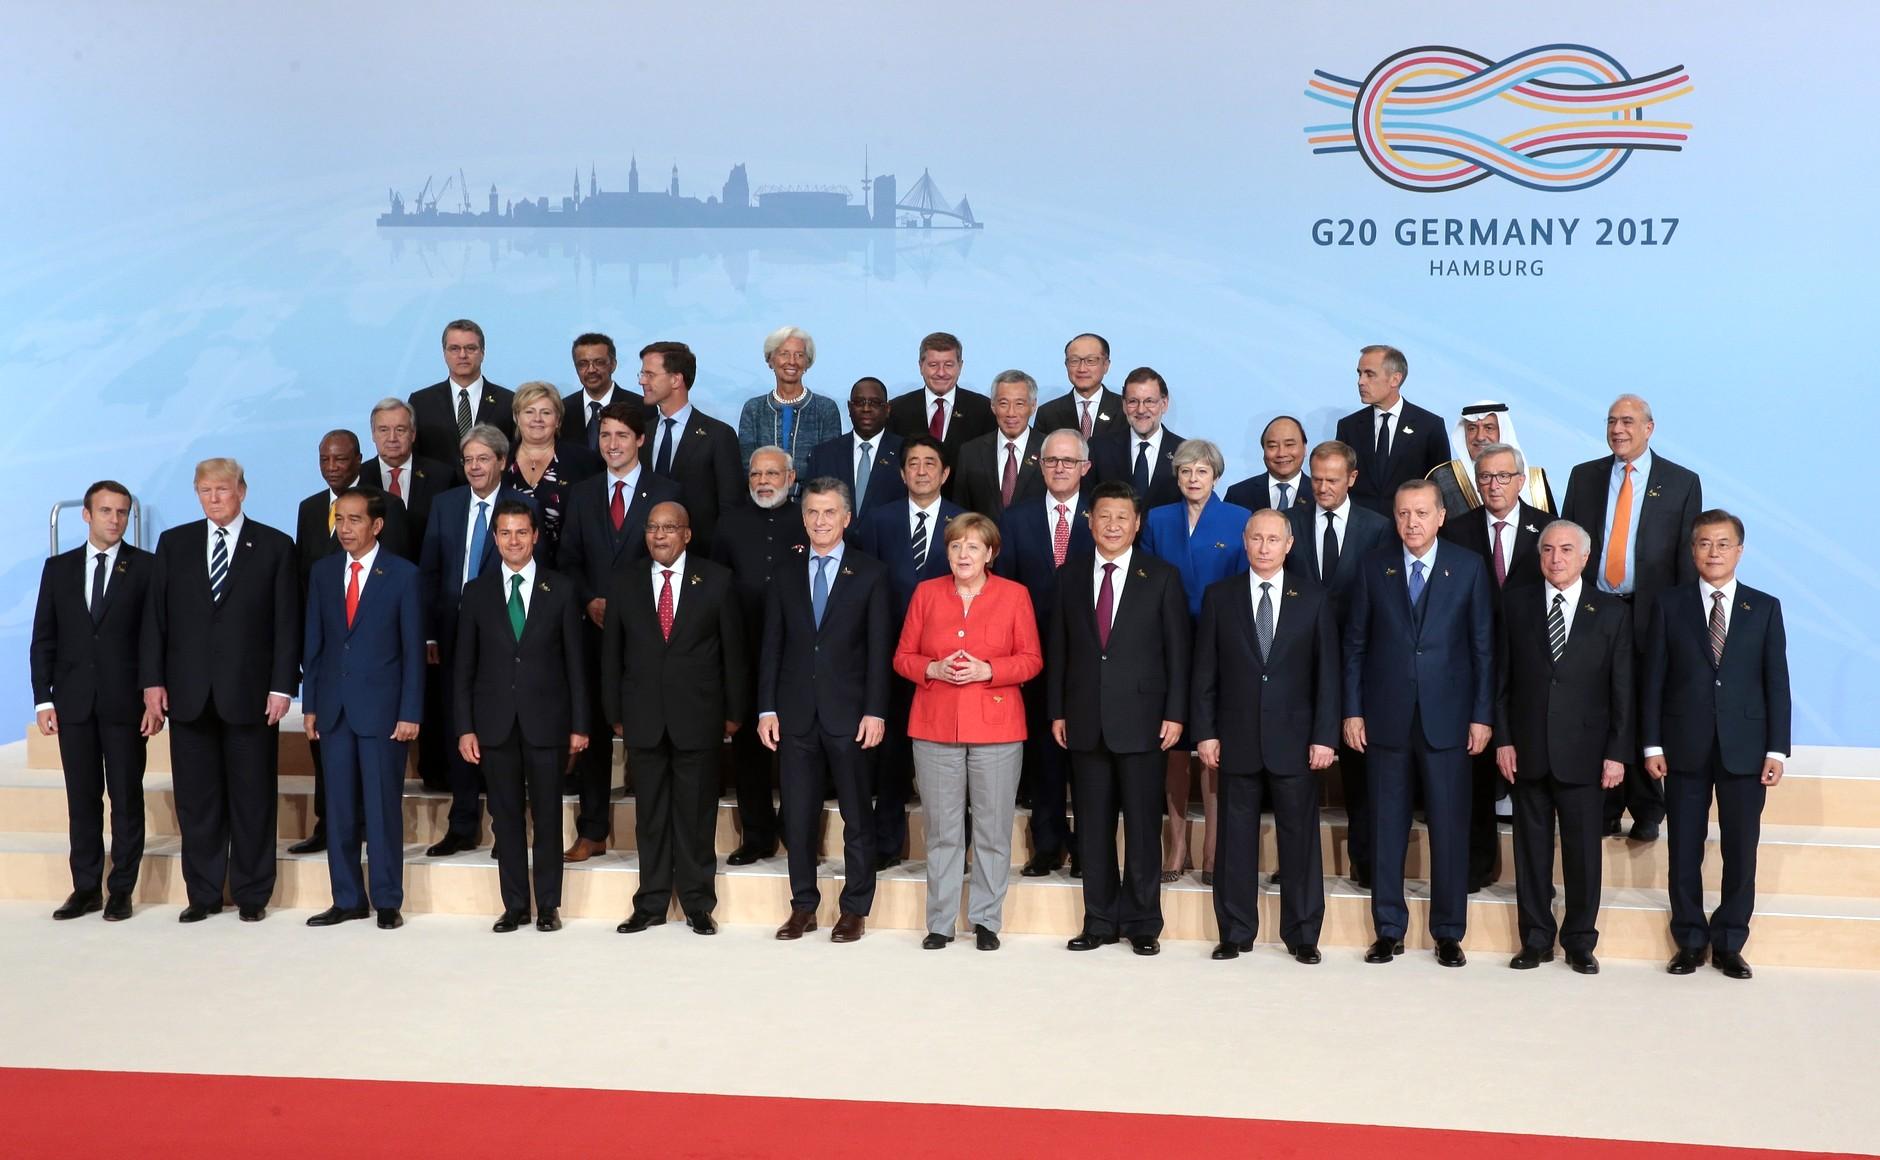 G20_Hamburg_summit_leaders_group_photo